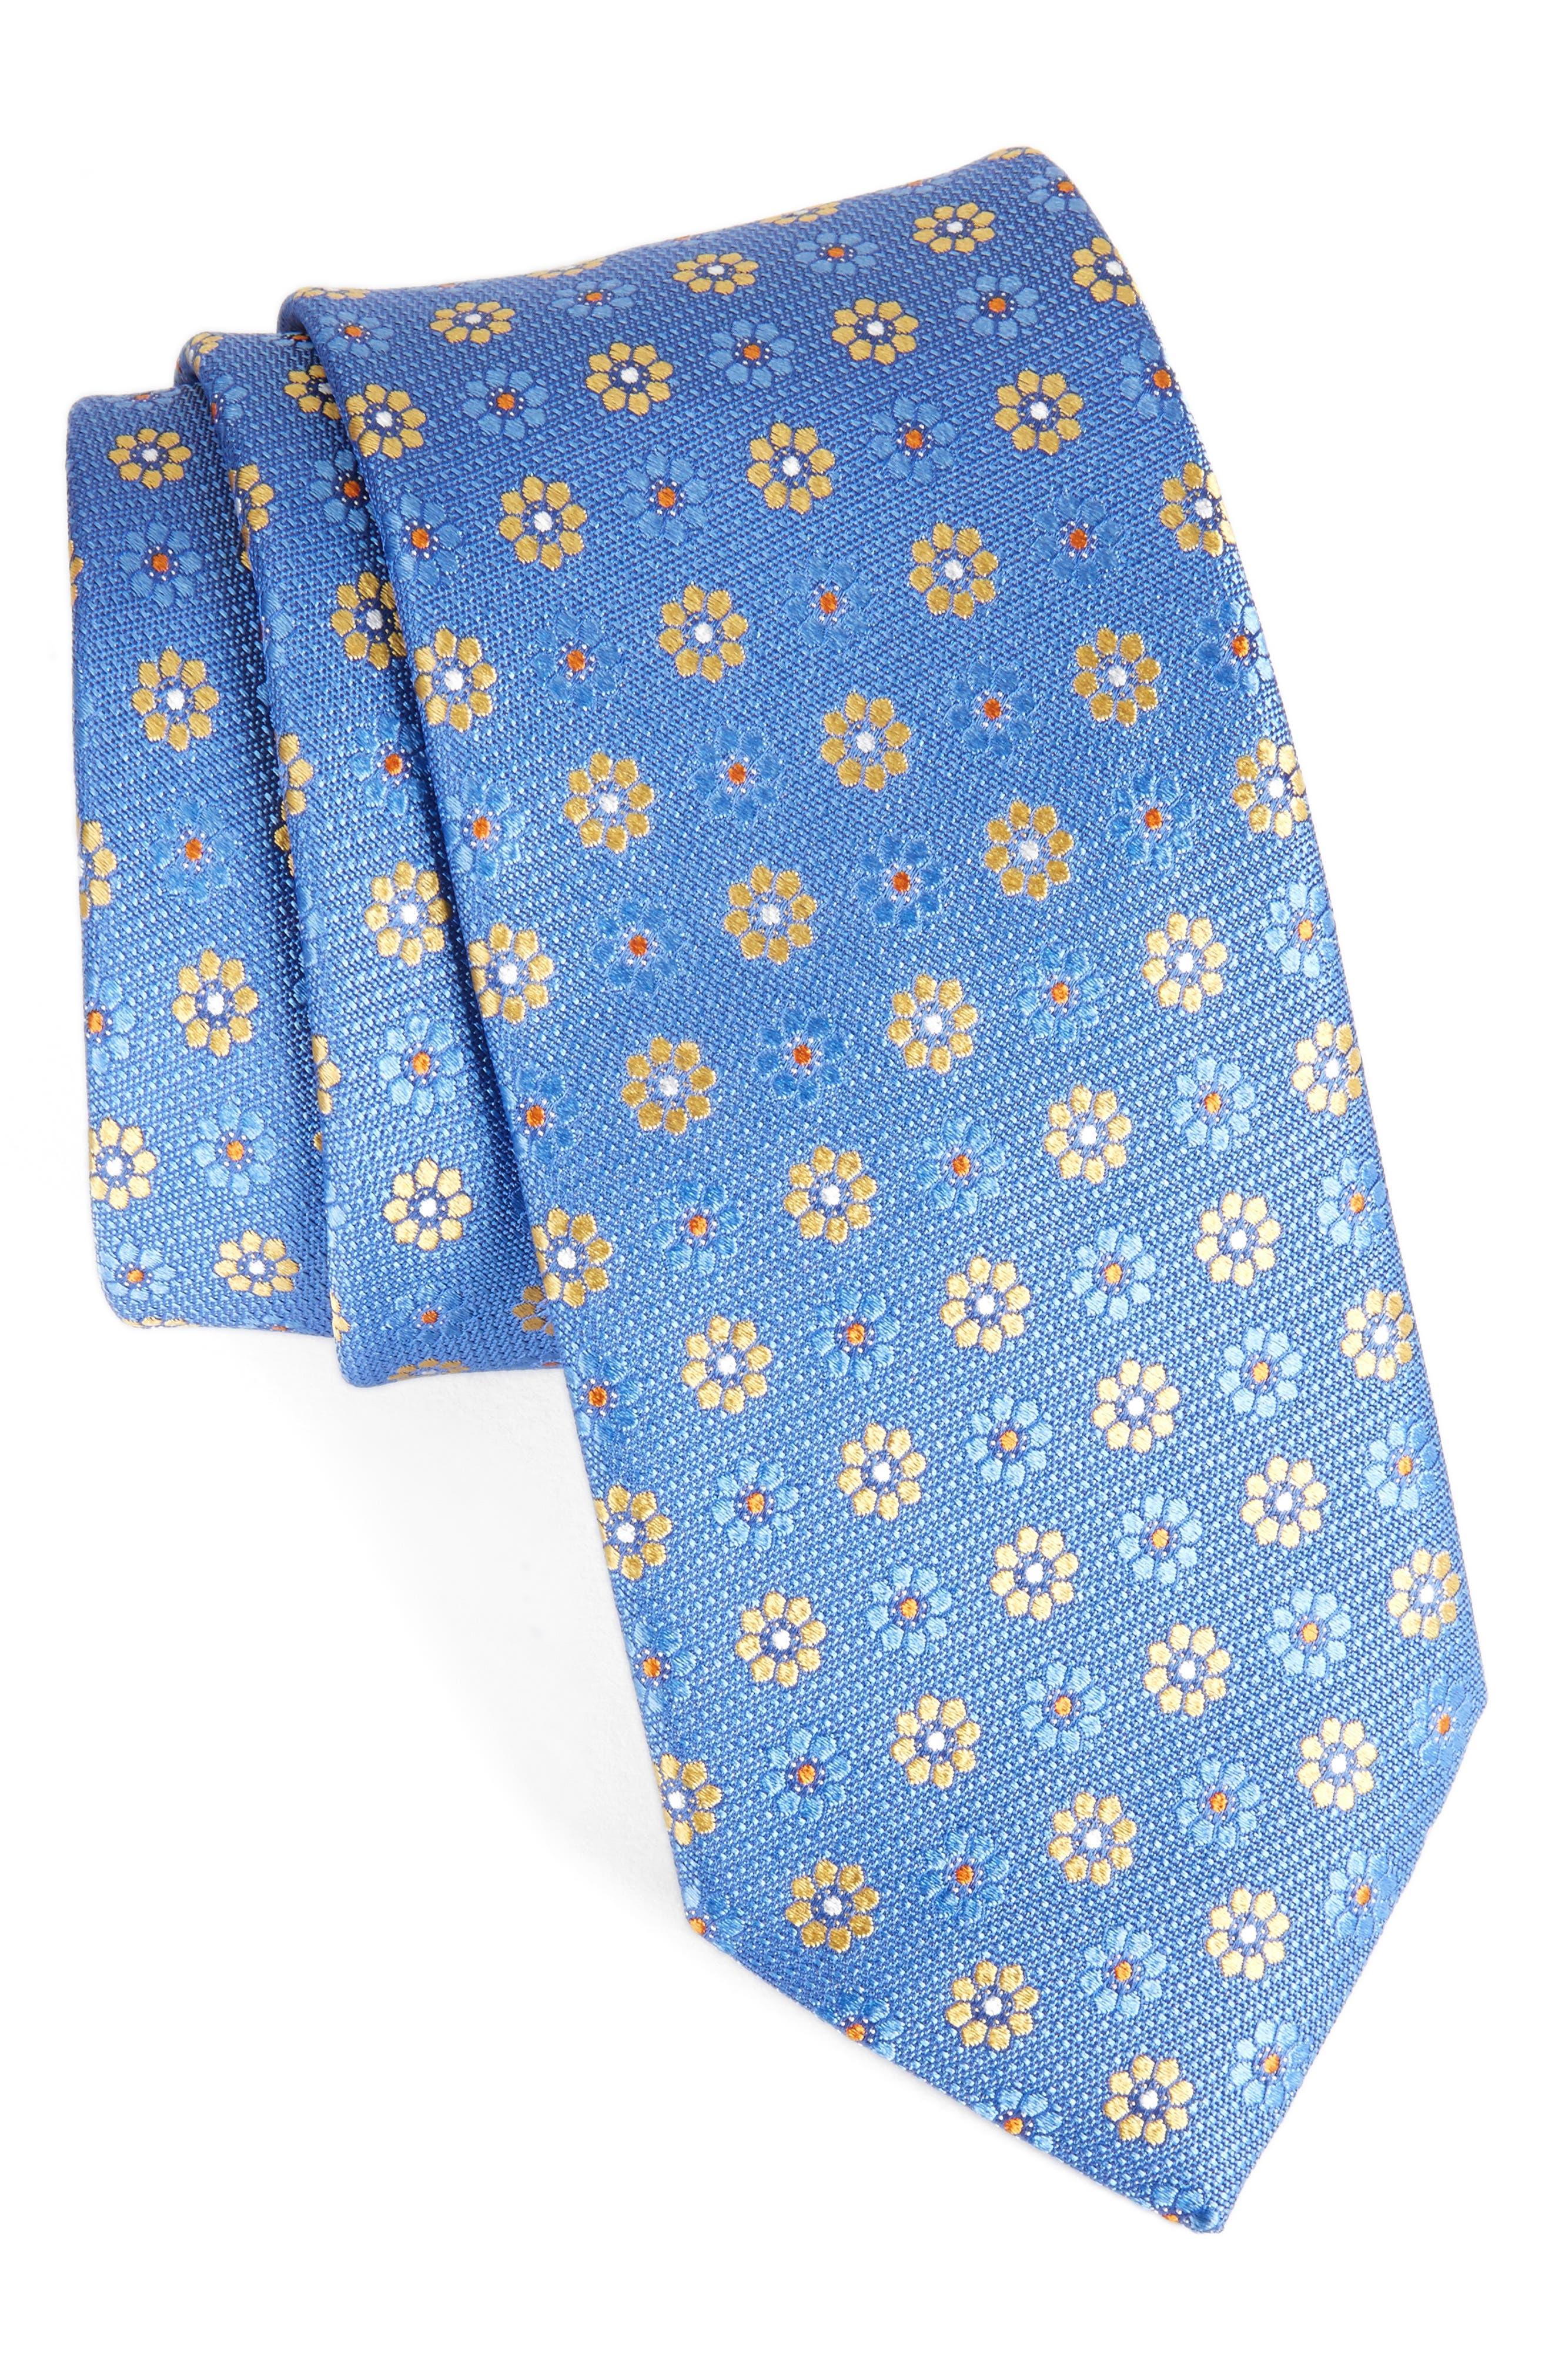 John W. Nordstrom Floral Silk Tie,                             Main thumbnail 3, color,